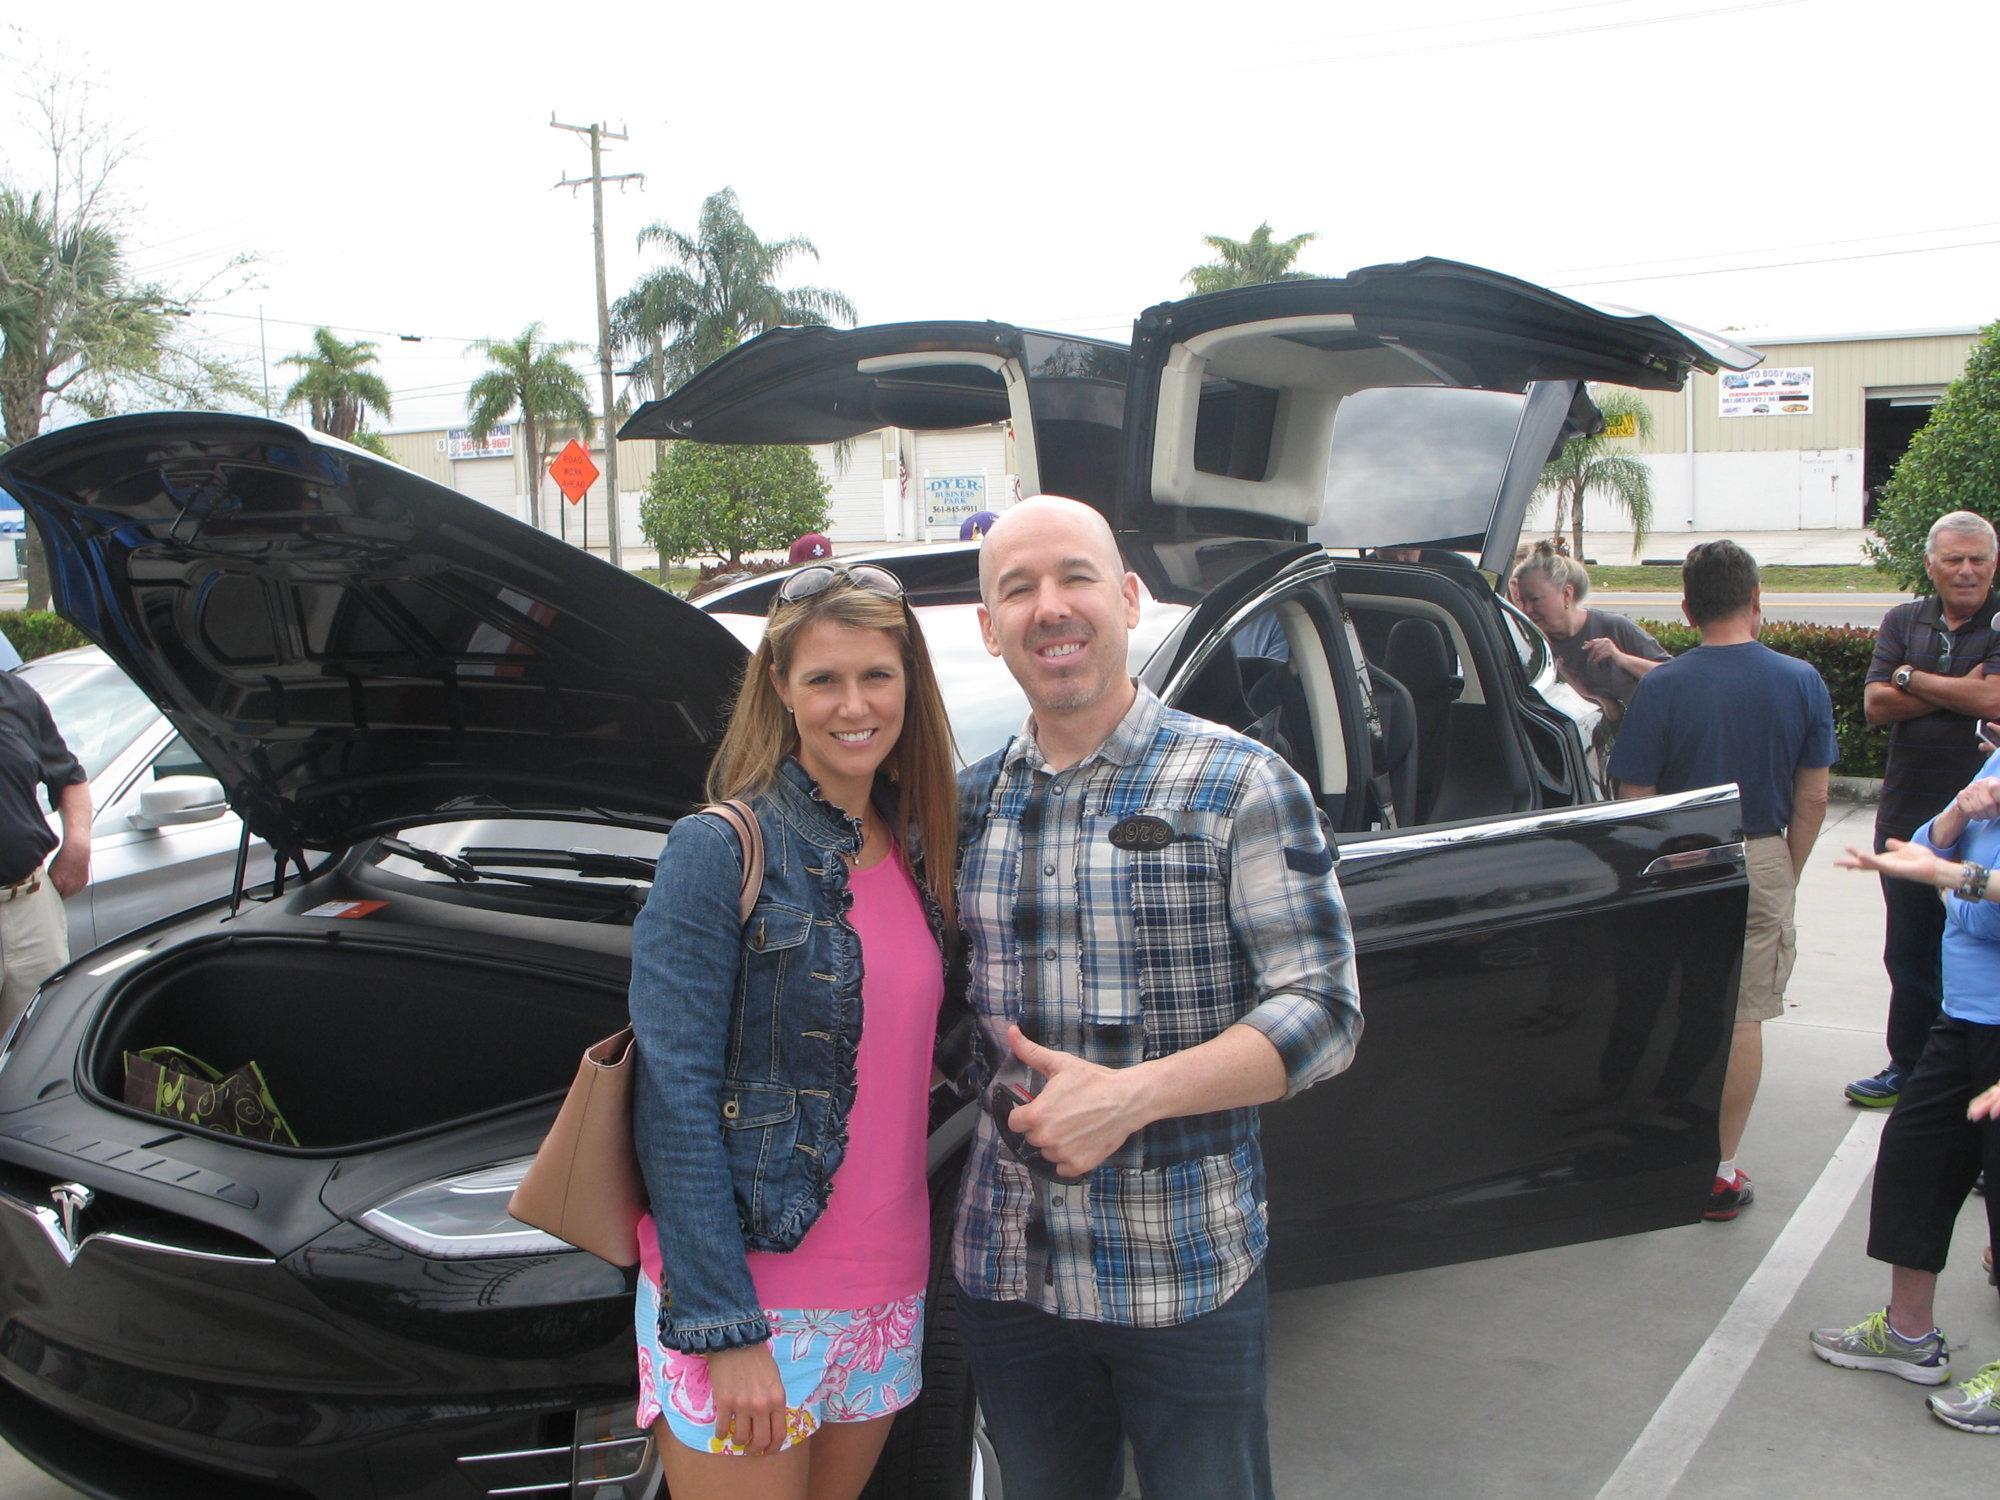 Model S Display West Palm Beach 033.JPG